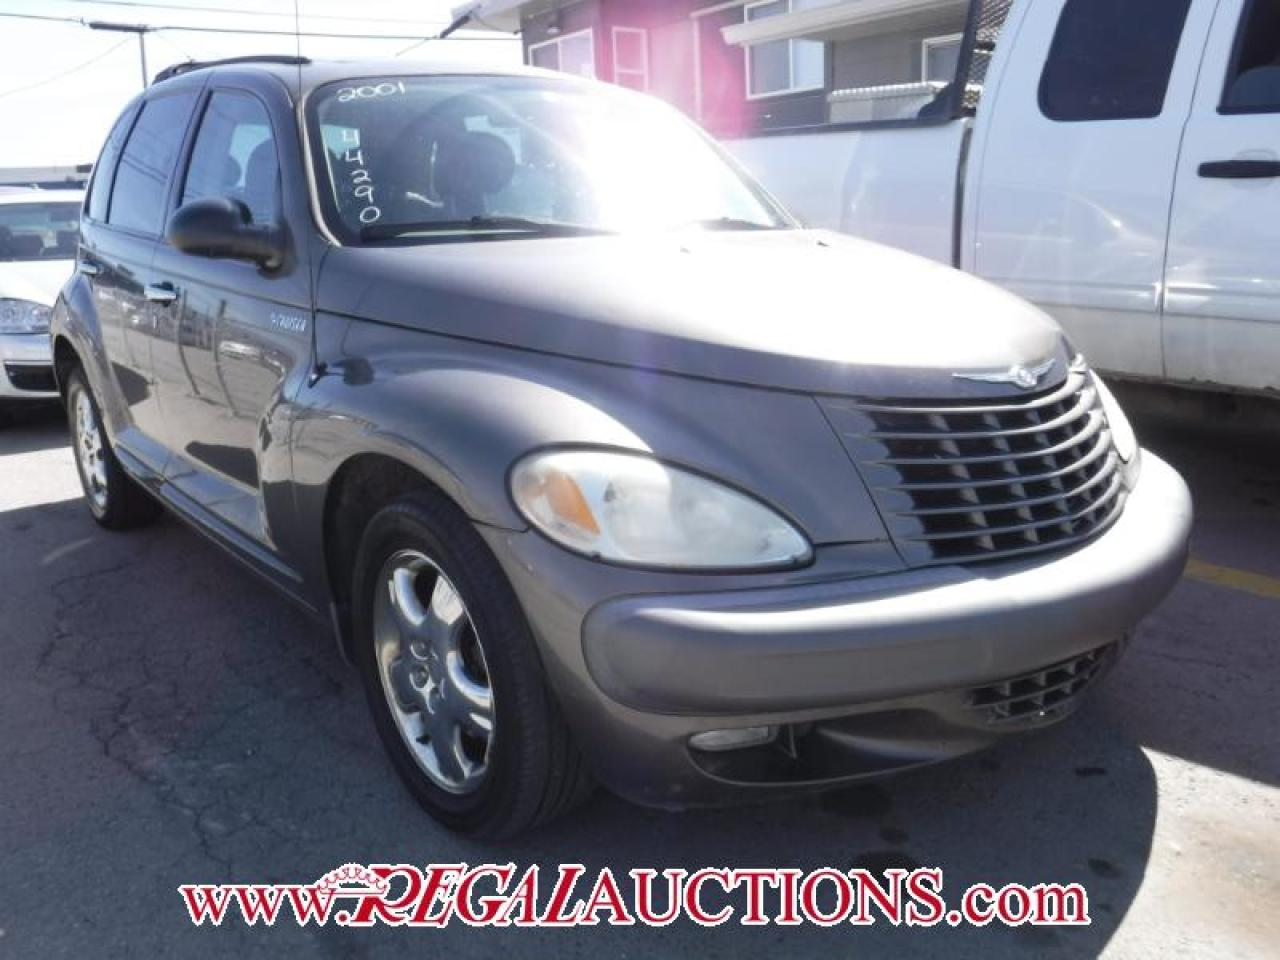 Photo of Grey 2001 Chrysler PT Cruiser